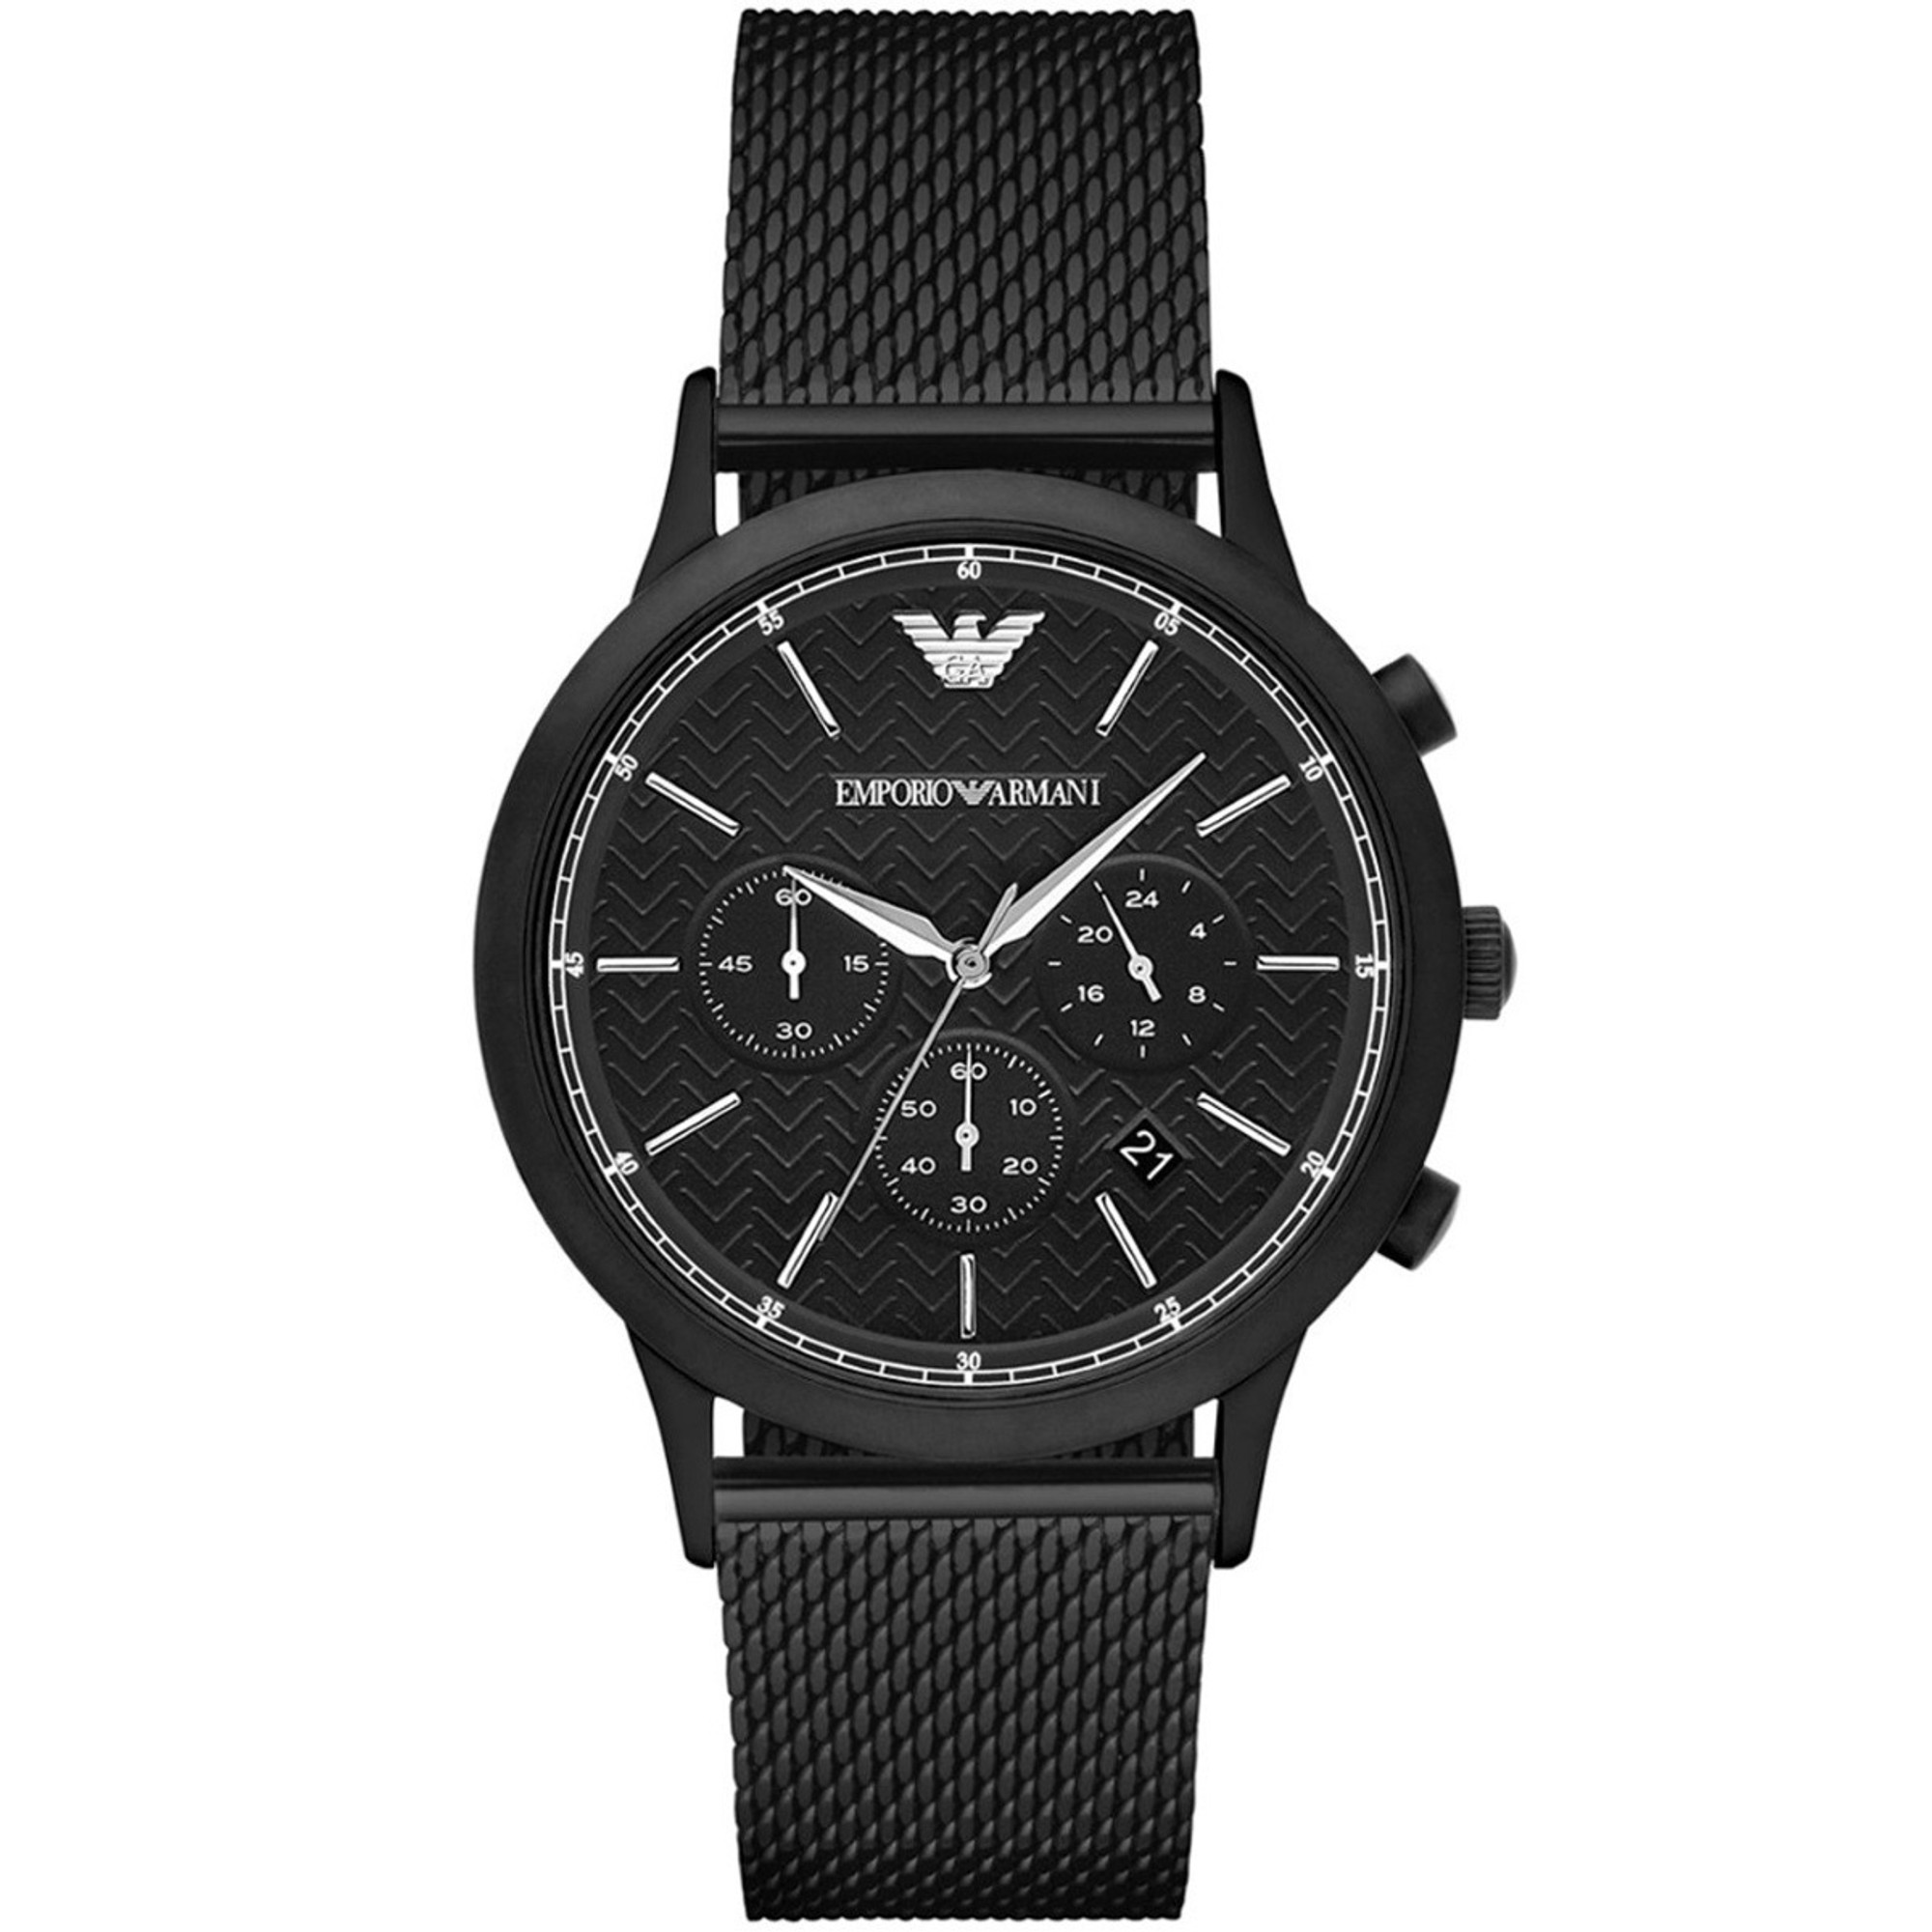 EMPORIO ARMANI Classic Watch Chronograph AR2498